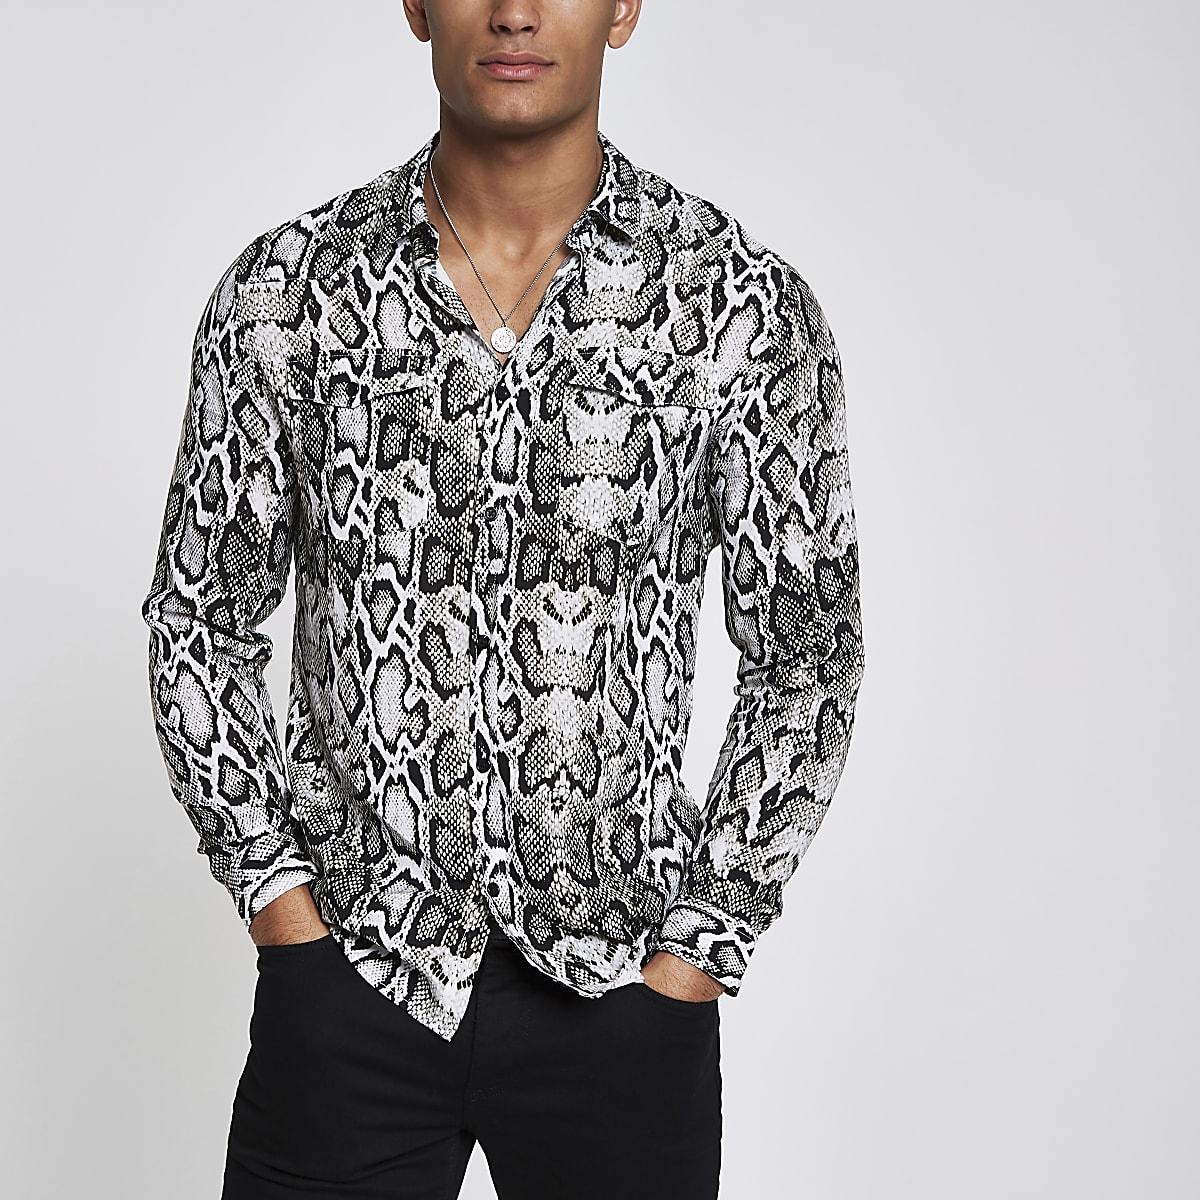 River island grey snake print shirt dress